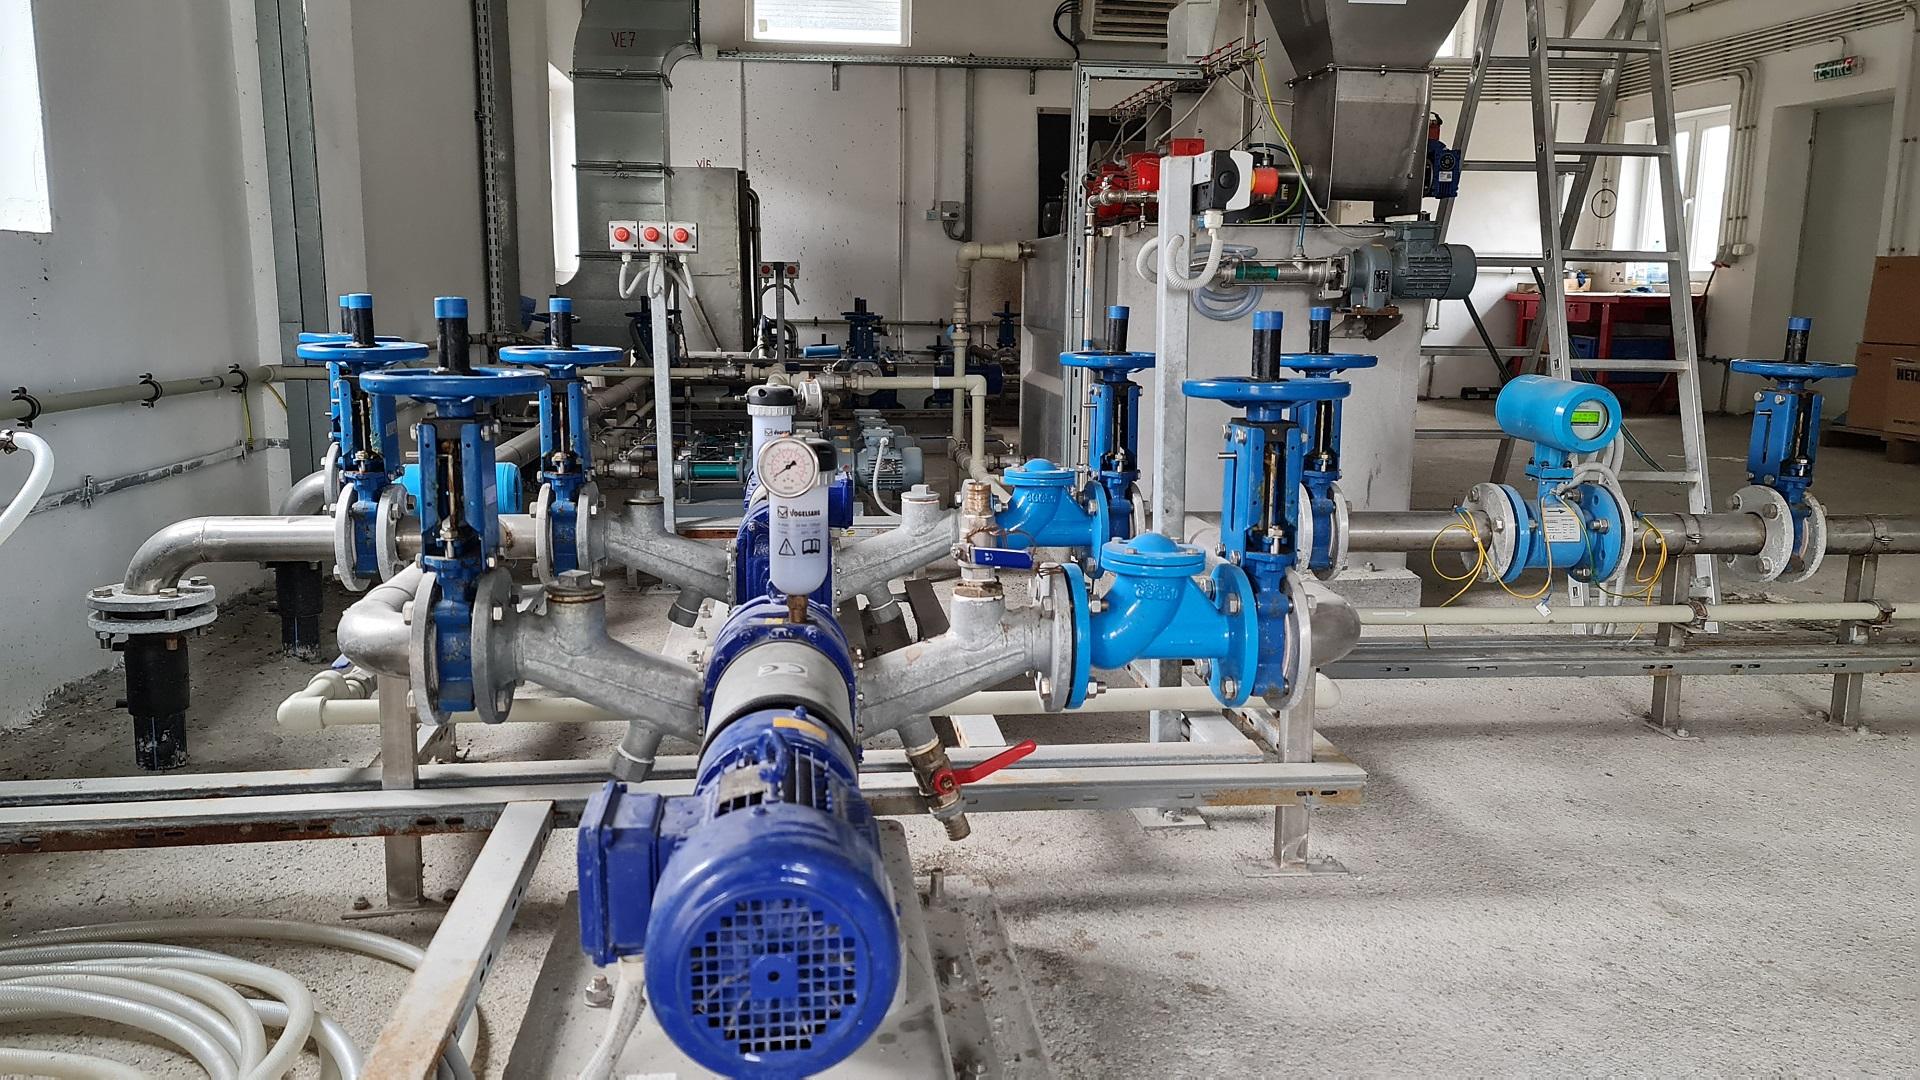 Angajăm inginer în domeniul mecanic / electromecanic / energetic